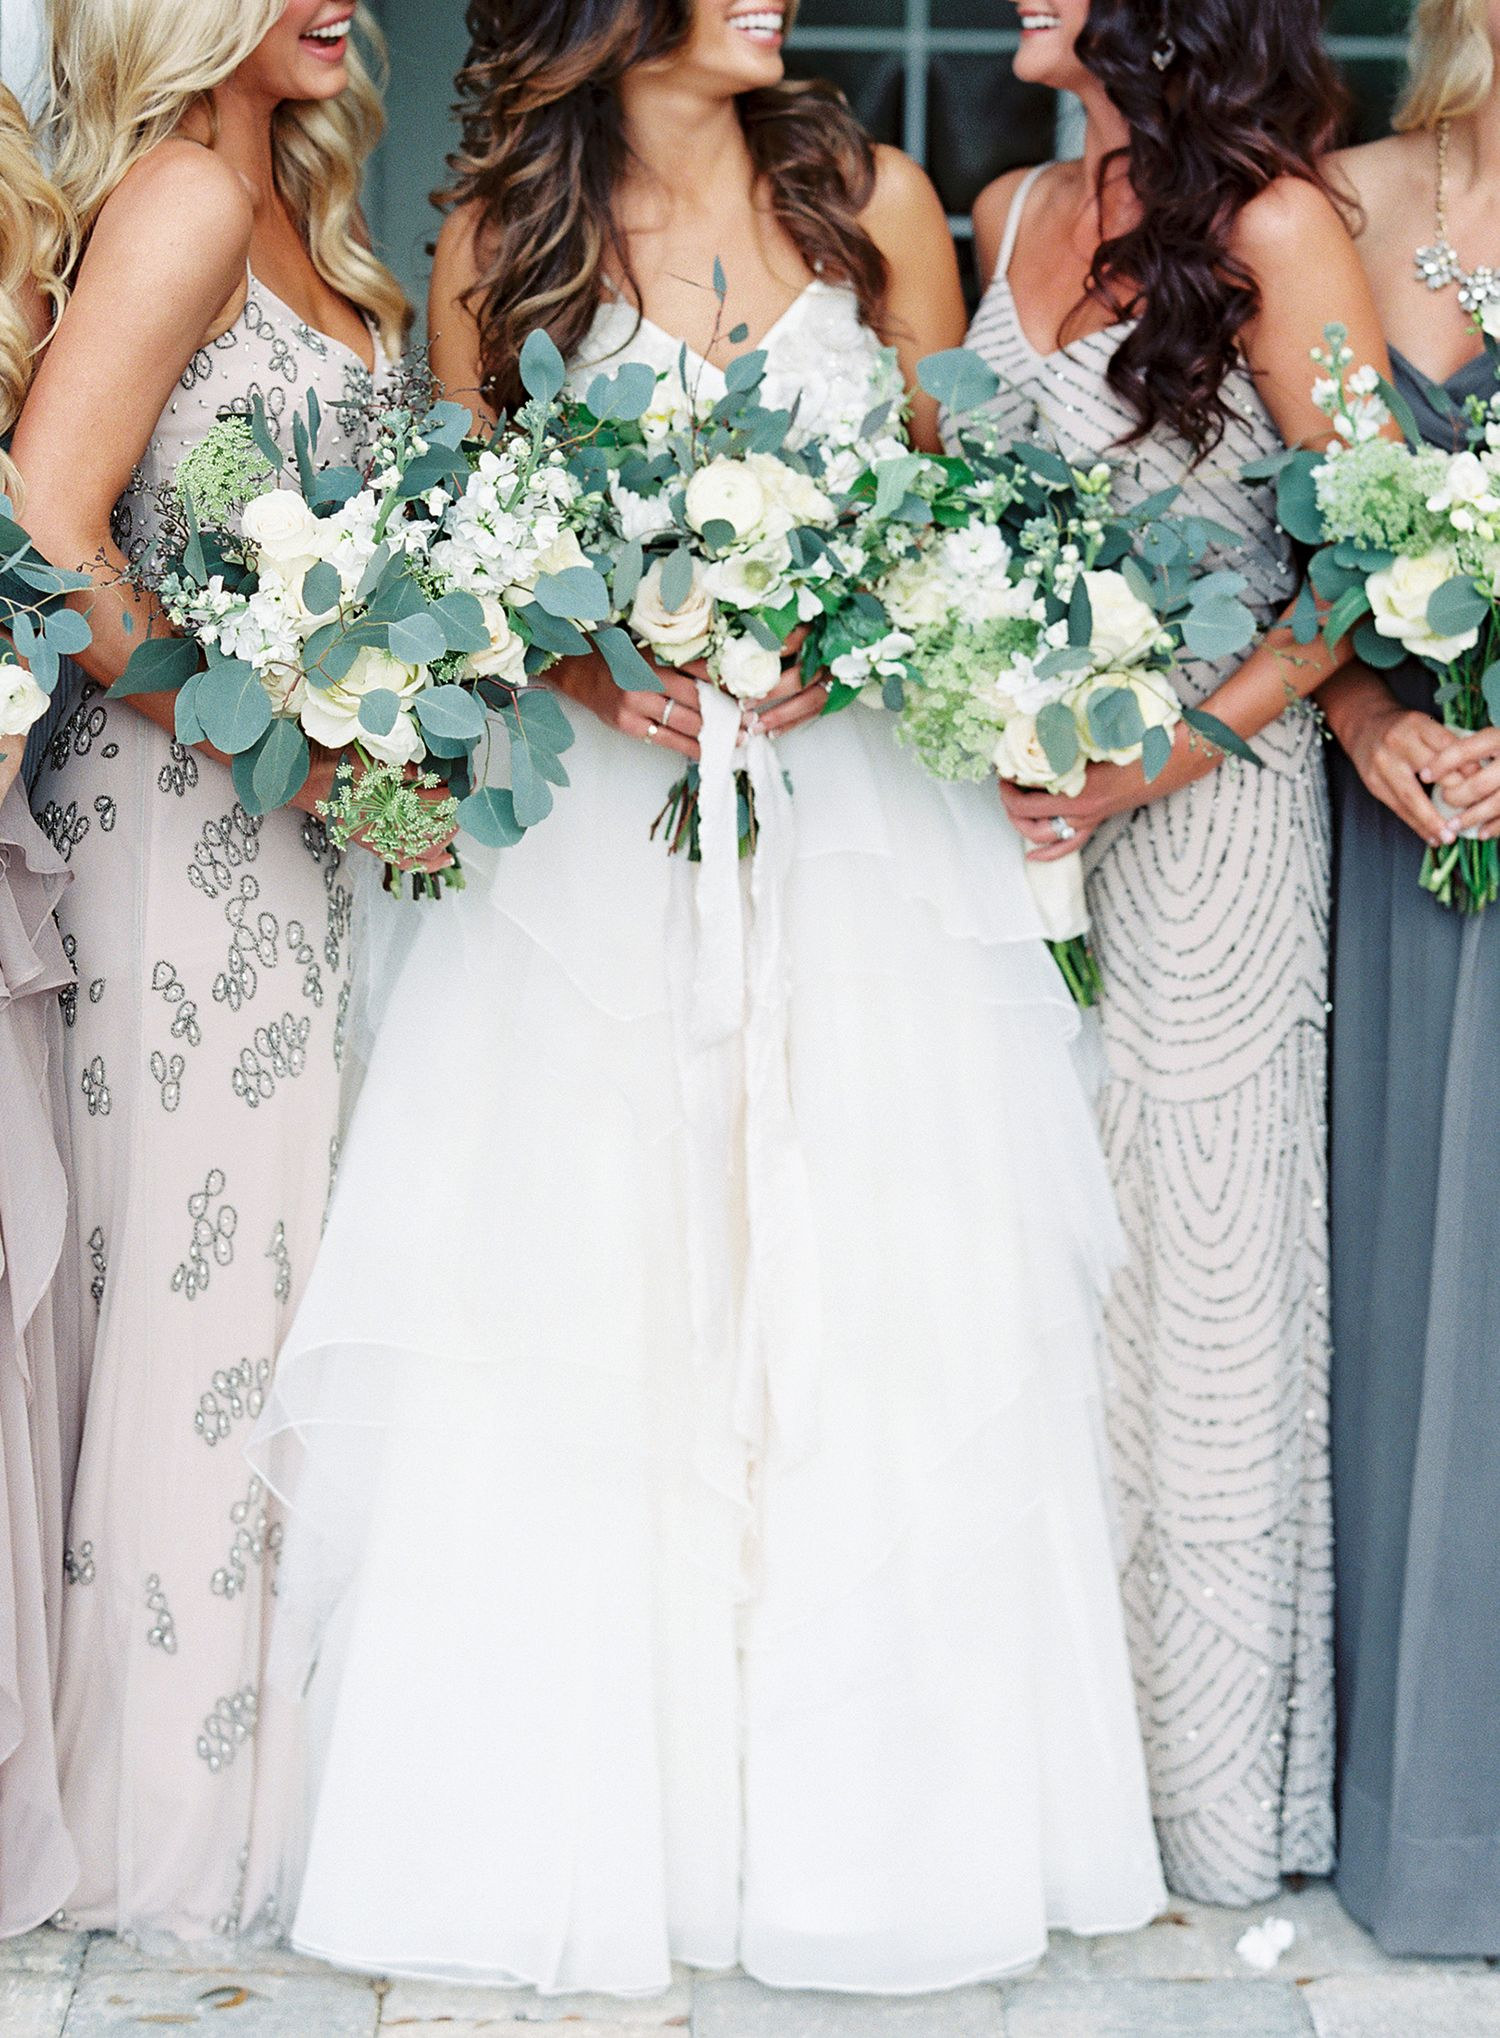 Dresses Www.wedding pictures, Pilotto peter spring runway